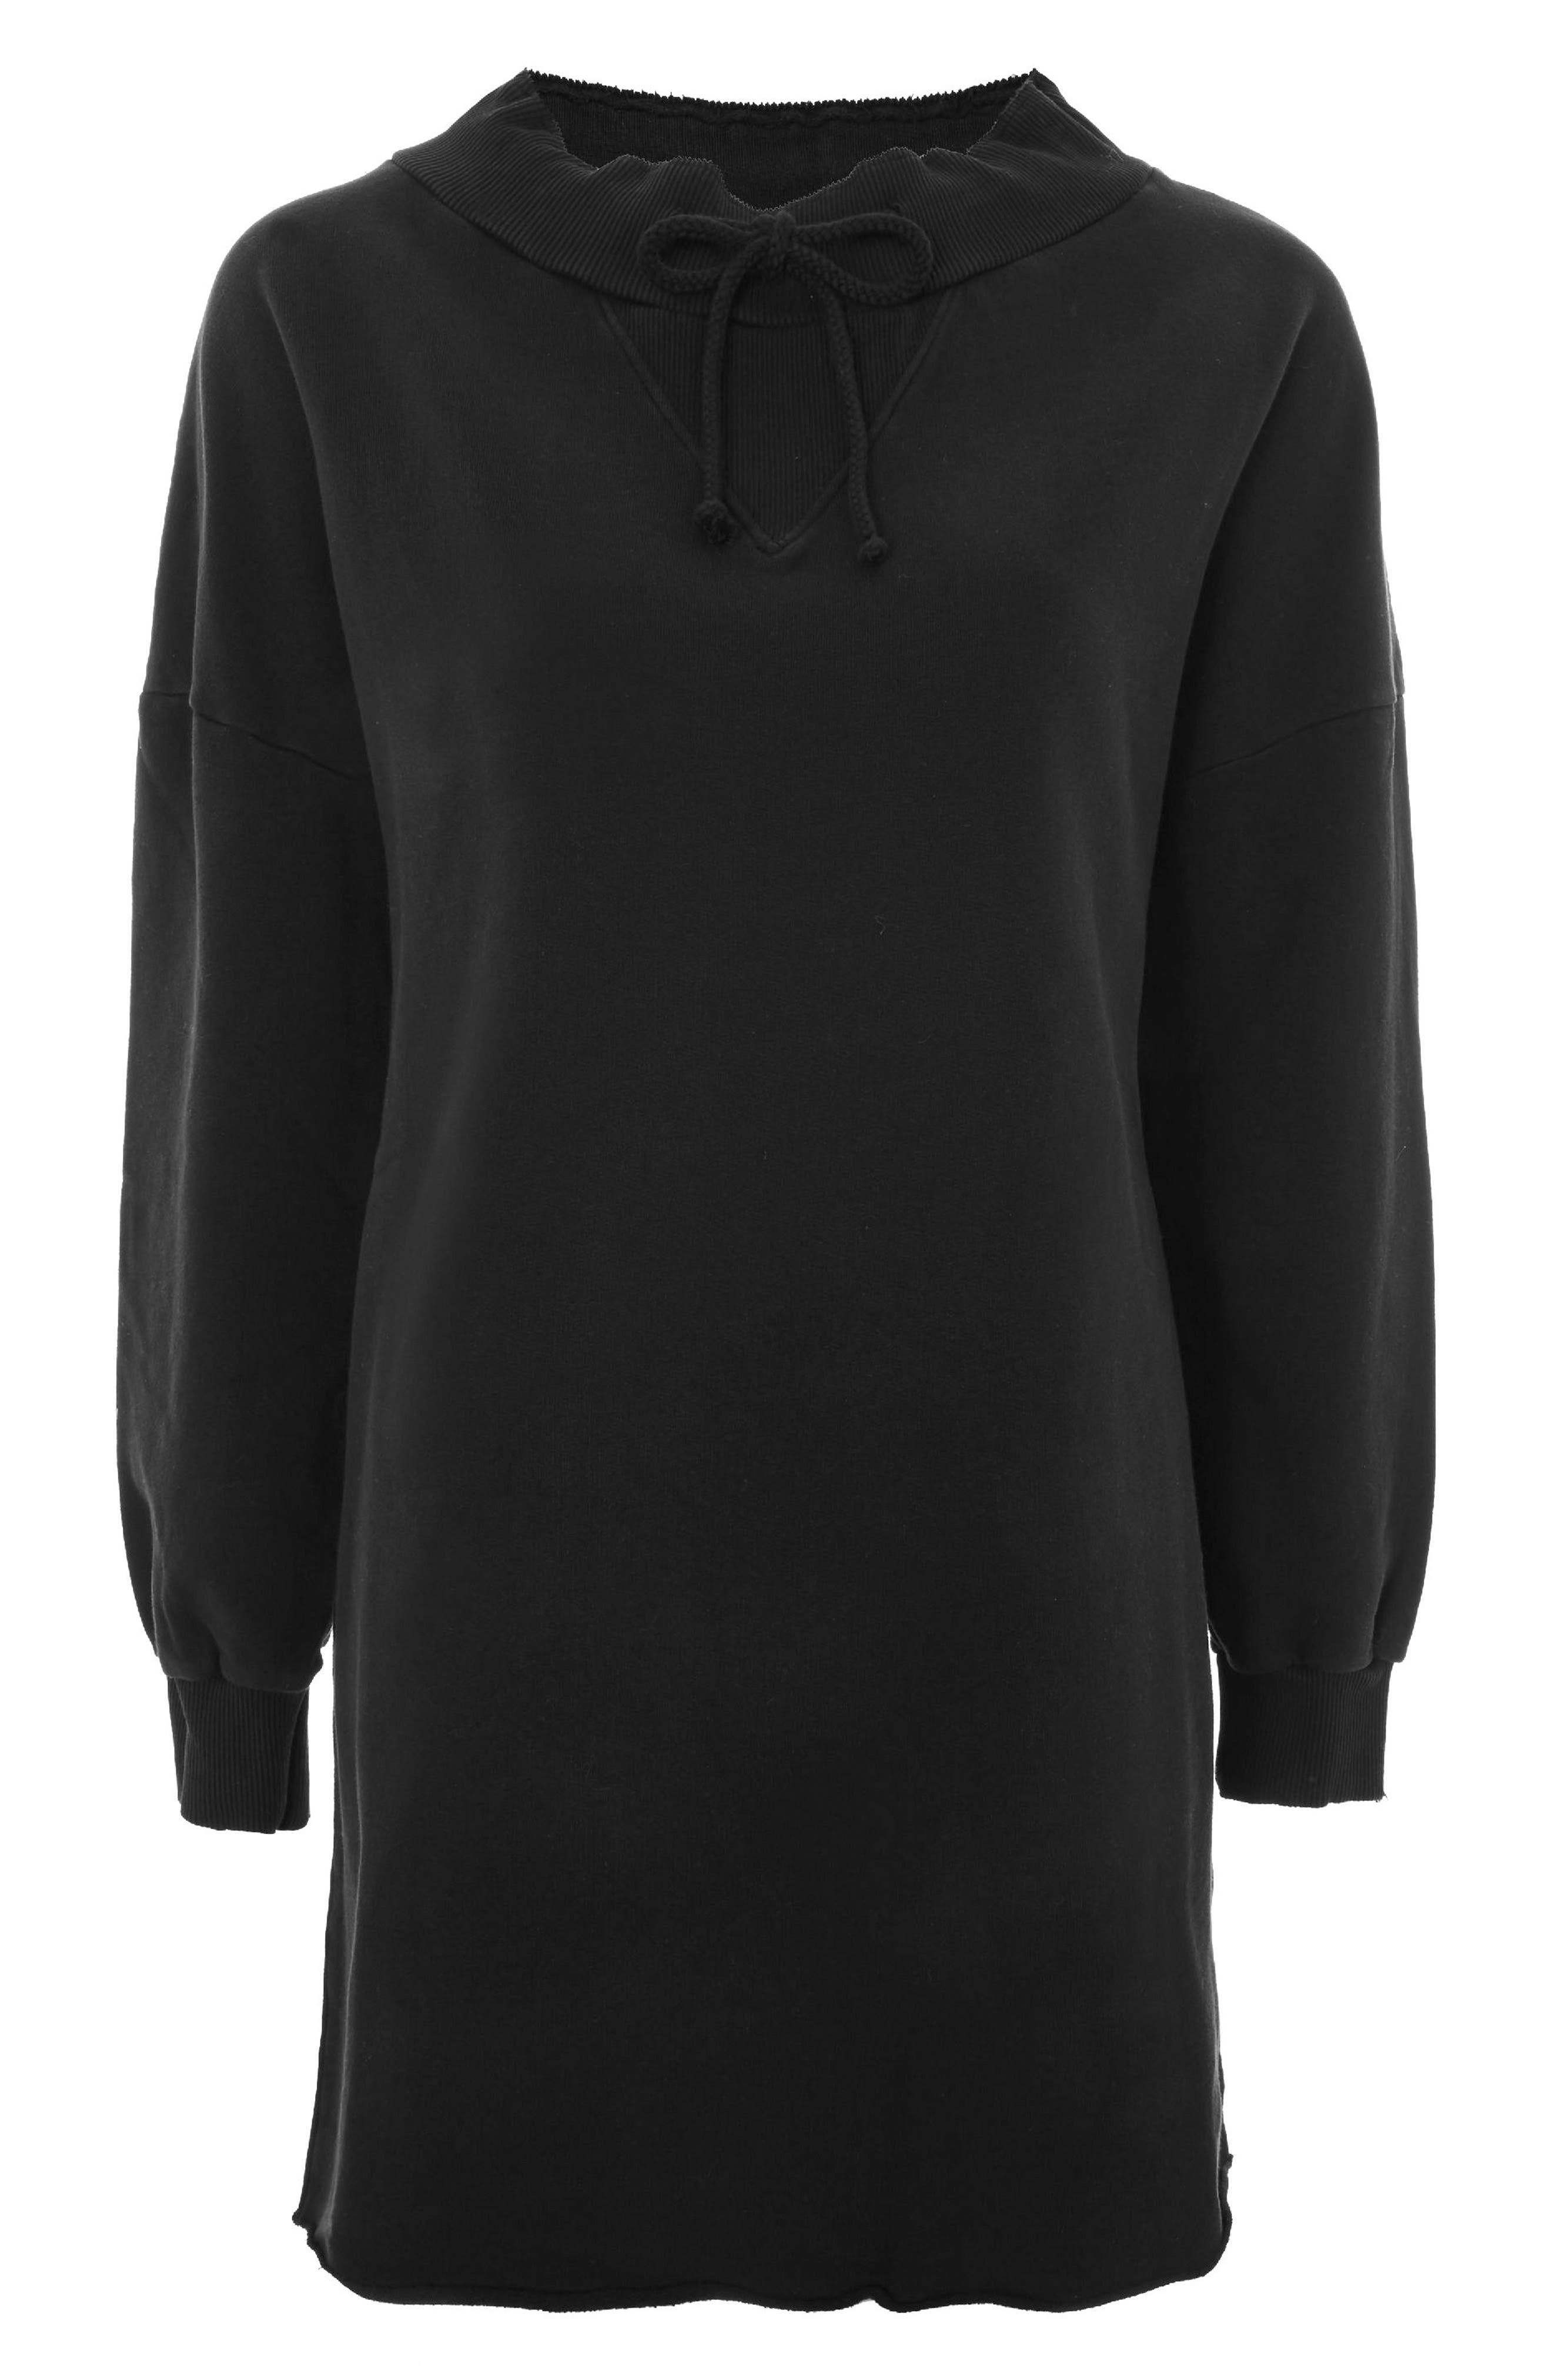 Alternate Image 1 Selected - Topshop Boutique Drawstring Sweater Dress